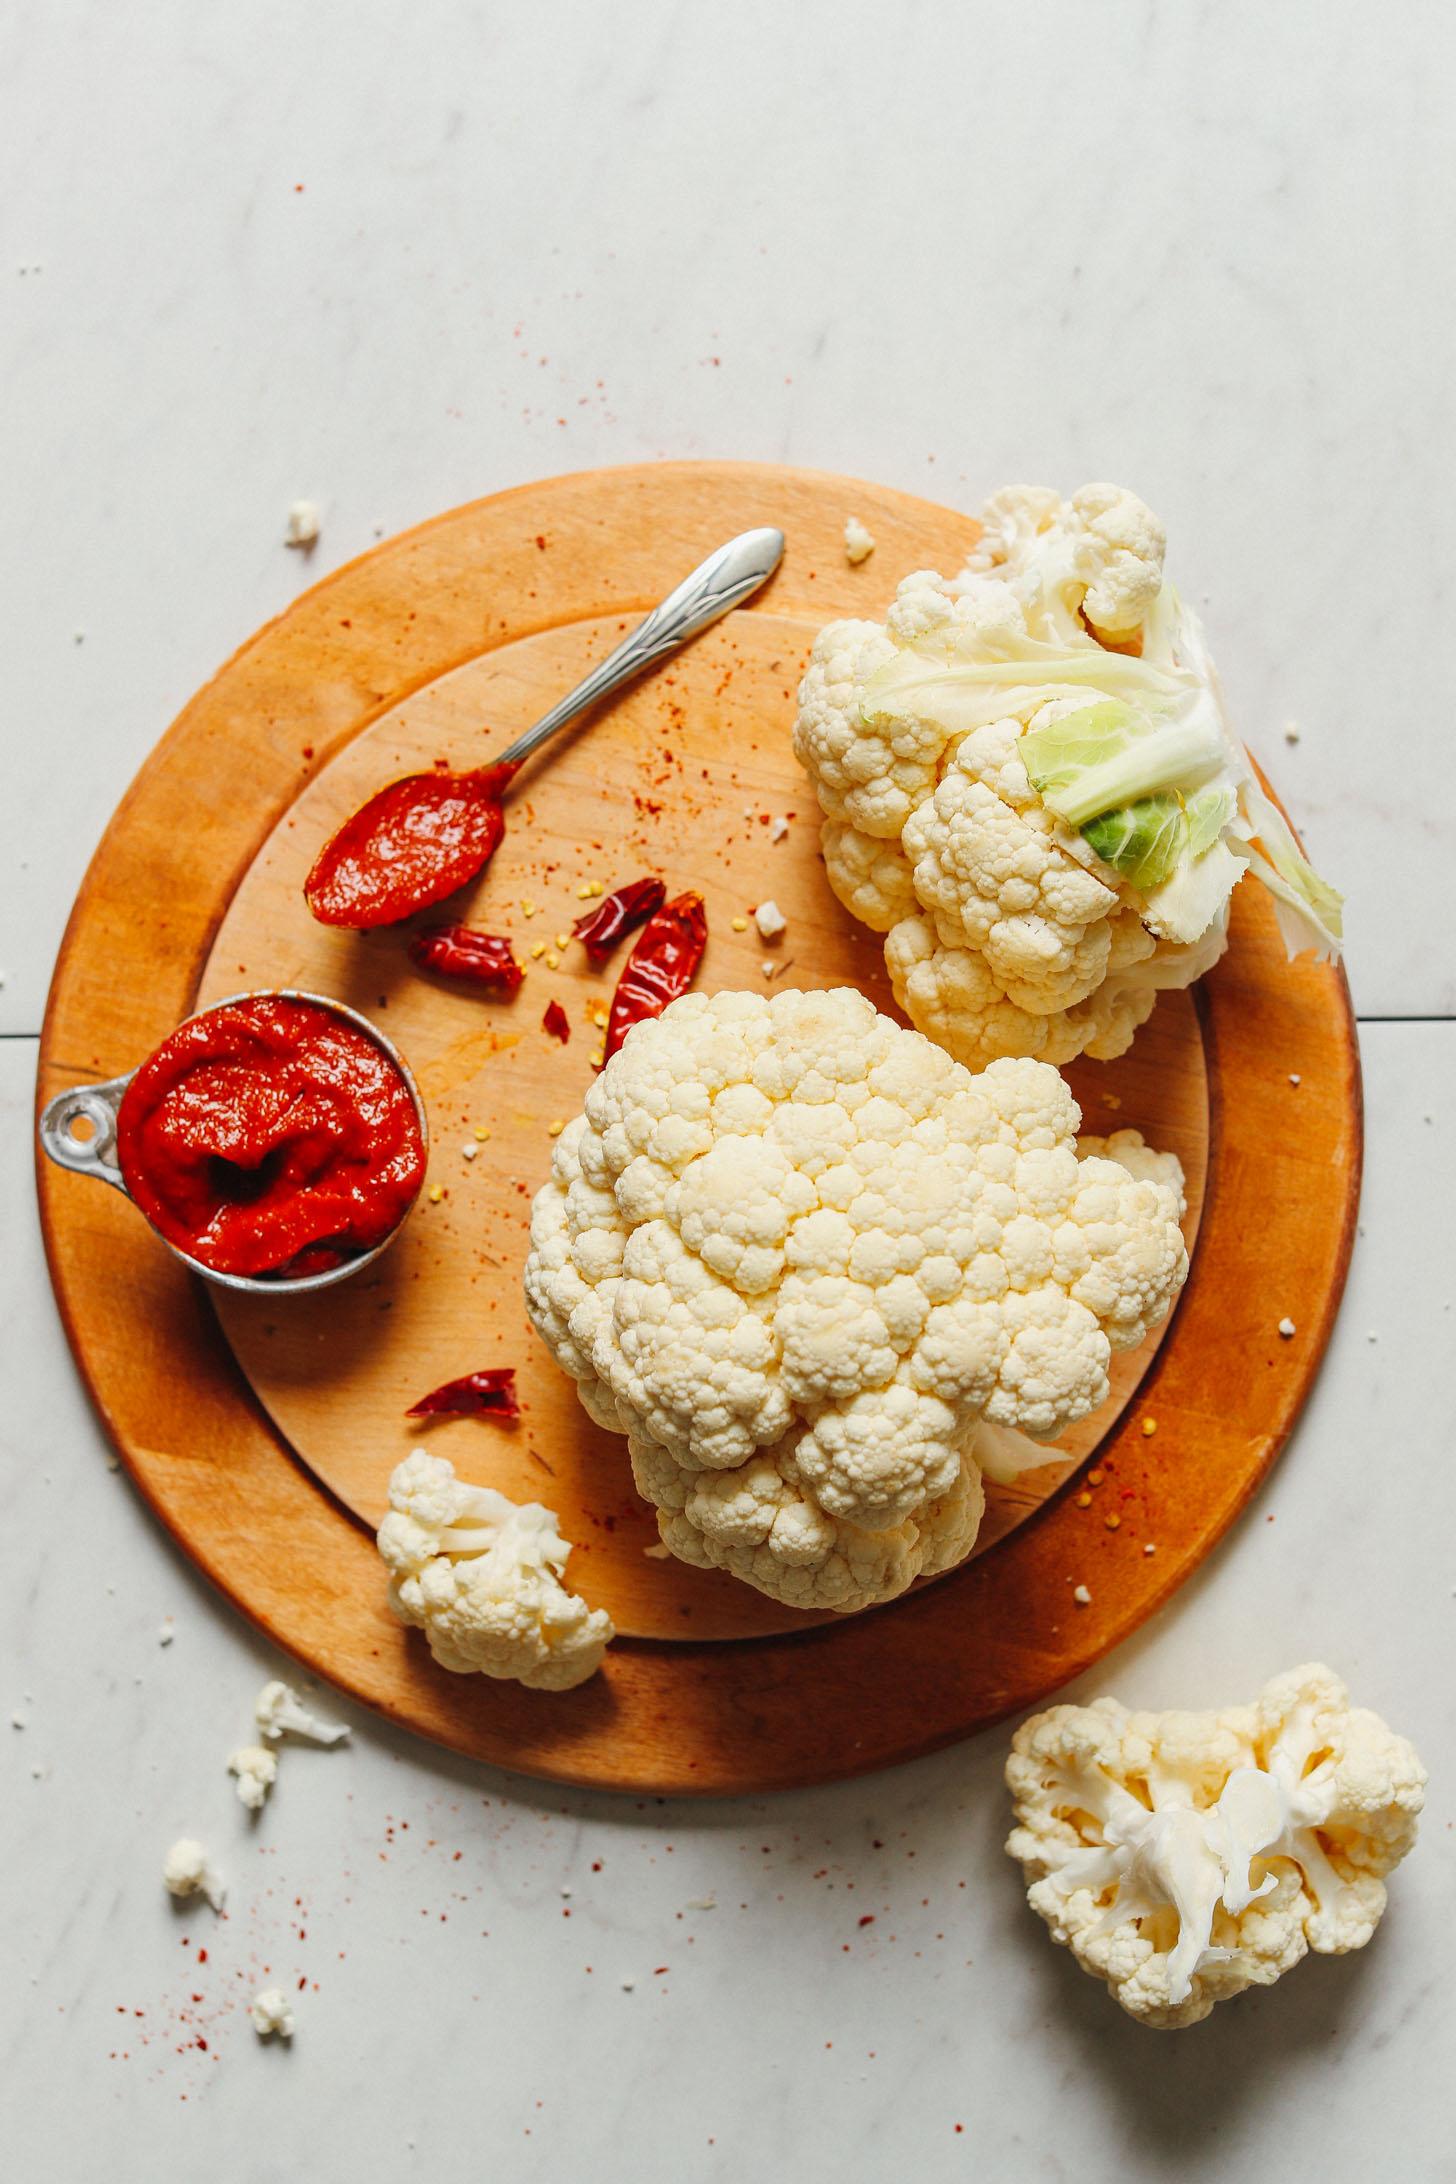 INCREDIBLE Korean-Spiced Cauliflower Wings! 8 ing, 30 min, BIG flavor! #vegan #glutenfree #cauliflower #plantbased #recipe #minimalistbaker